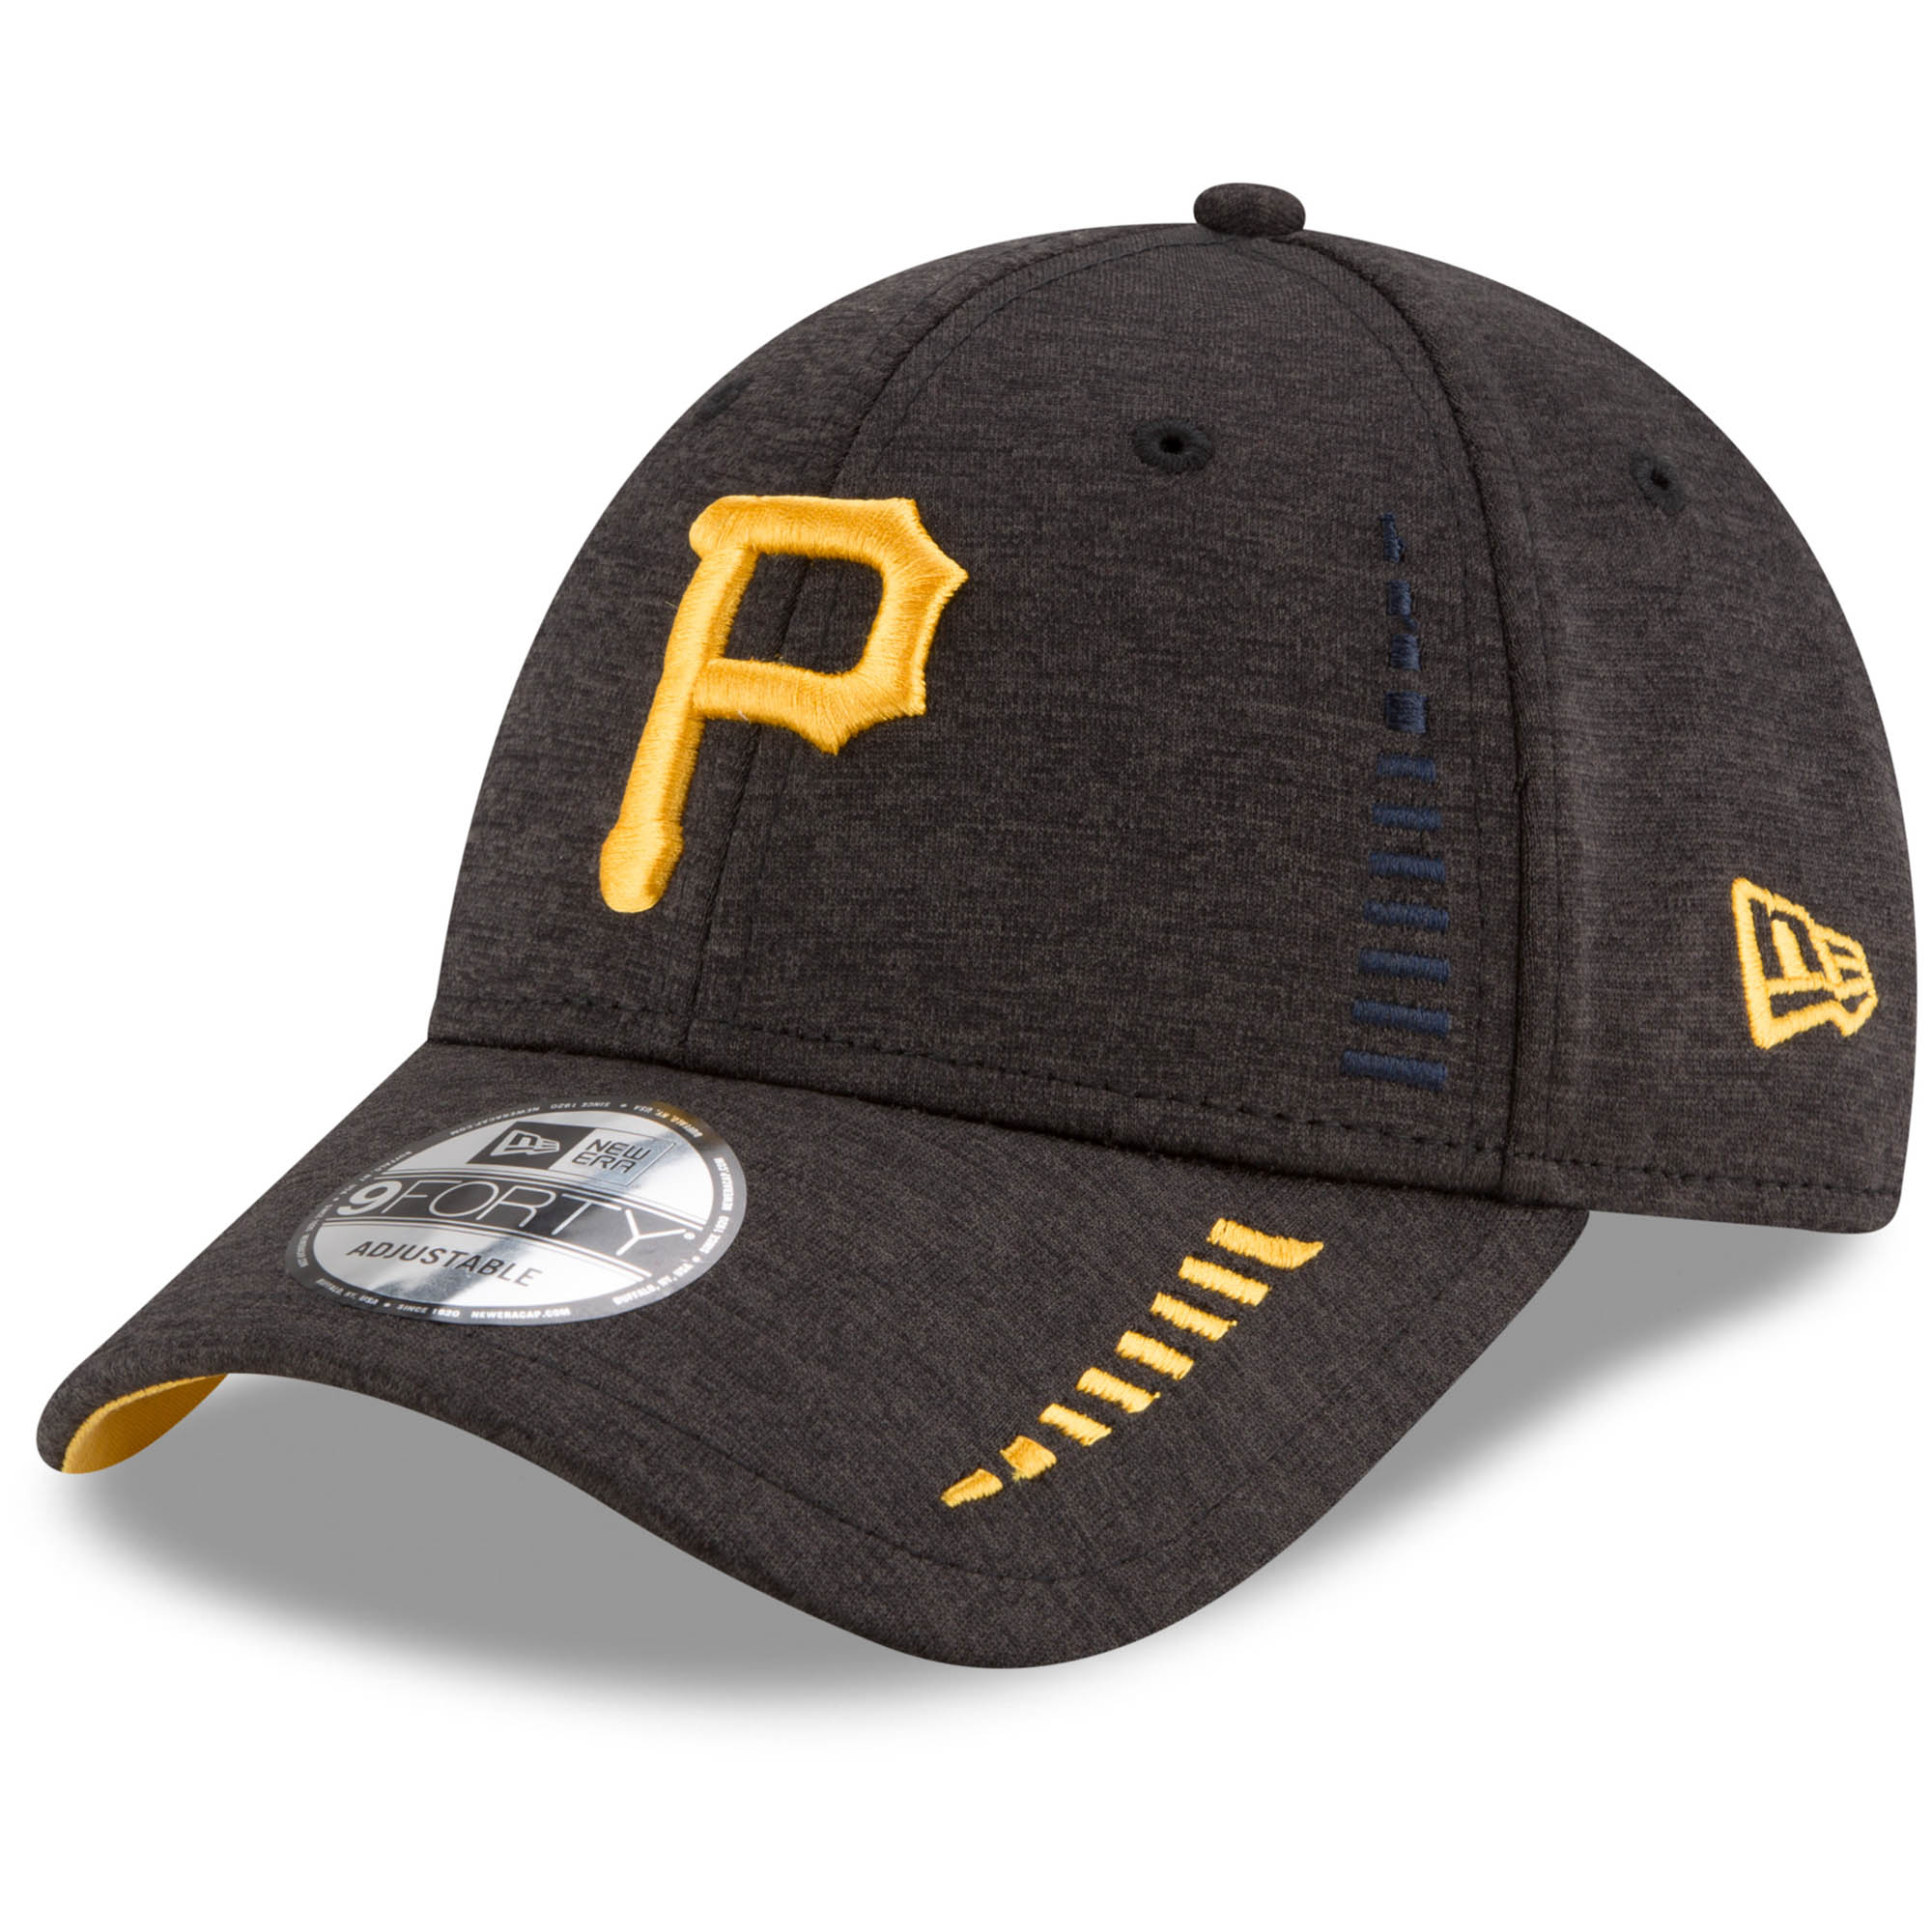 Pittsburgh Pirates New Era Speed Shadow Tech 9FORTY Adjustable Hat - Black - OSFA